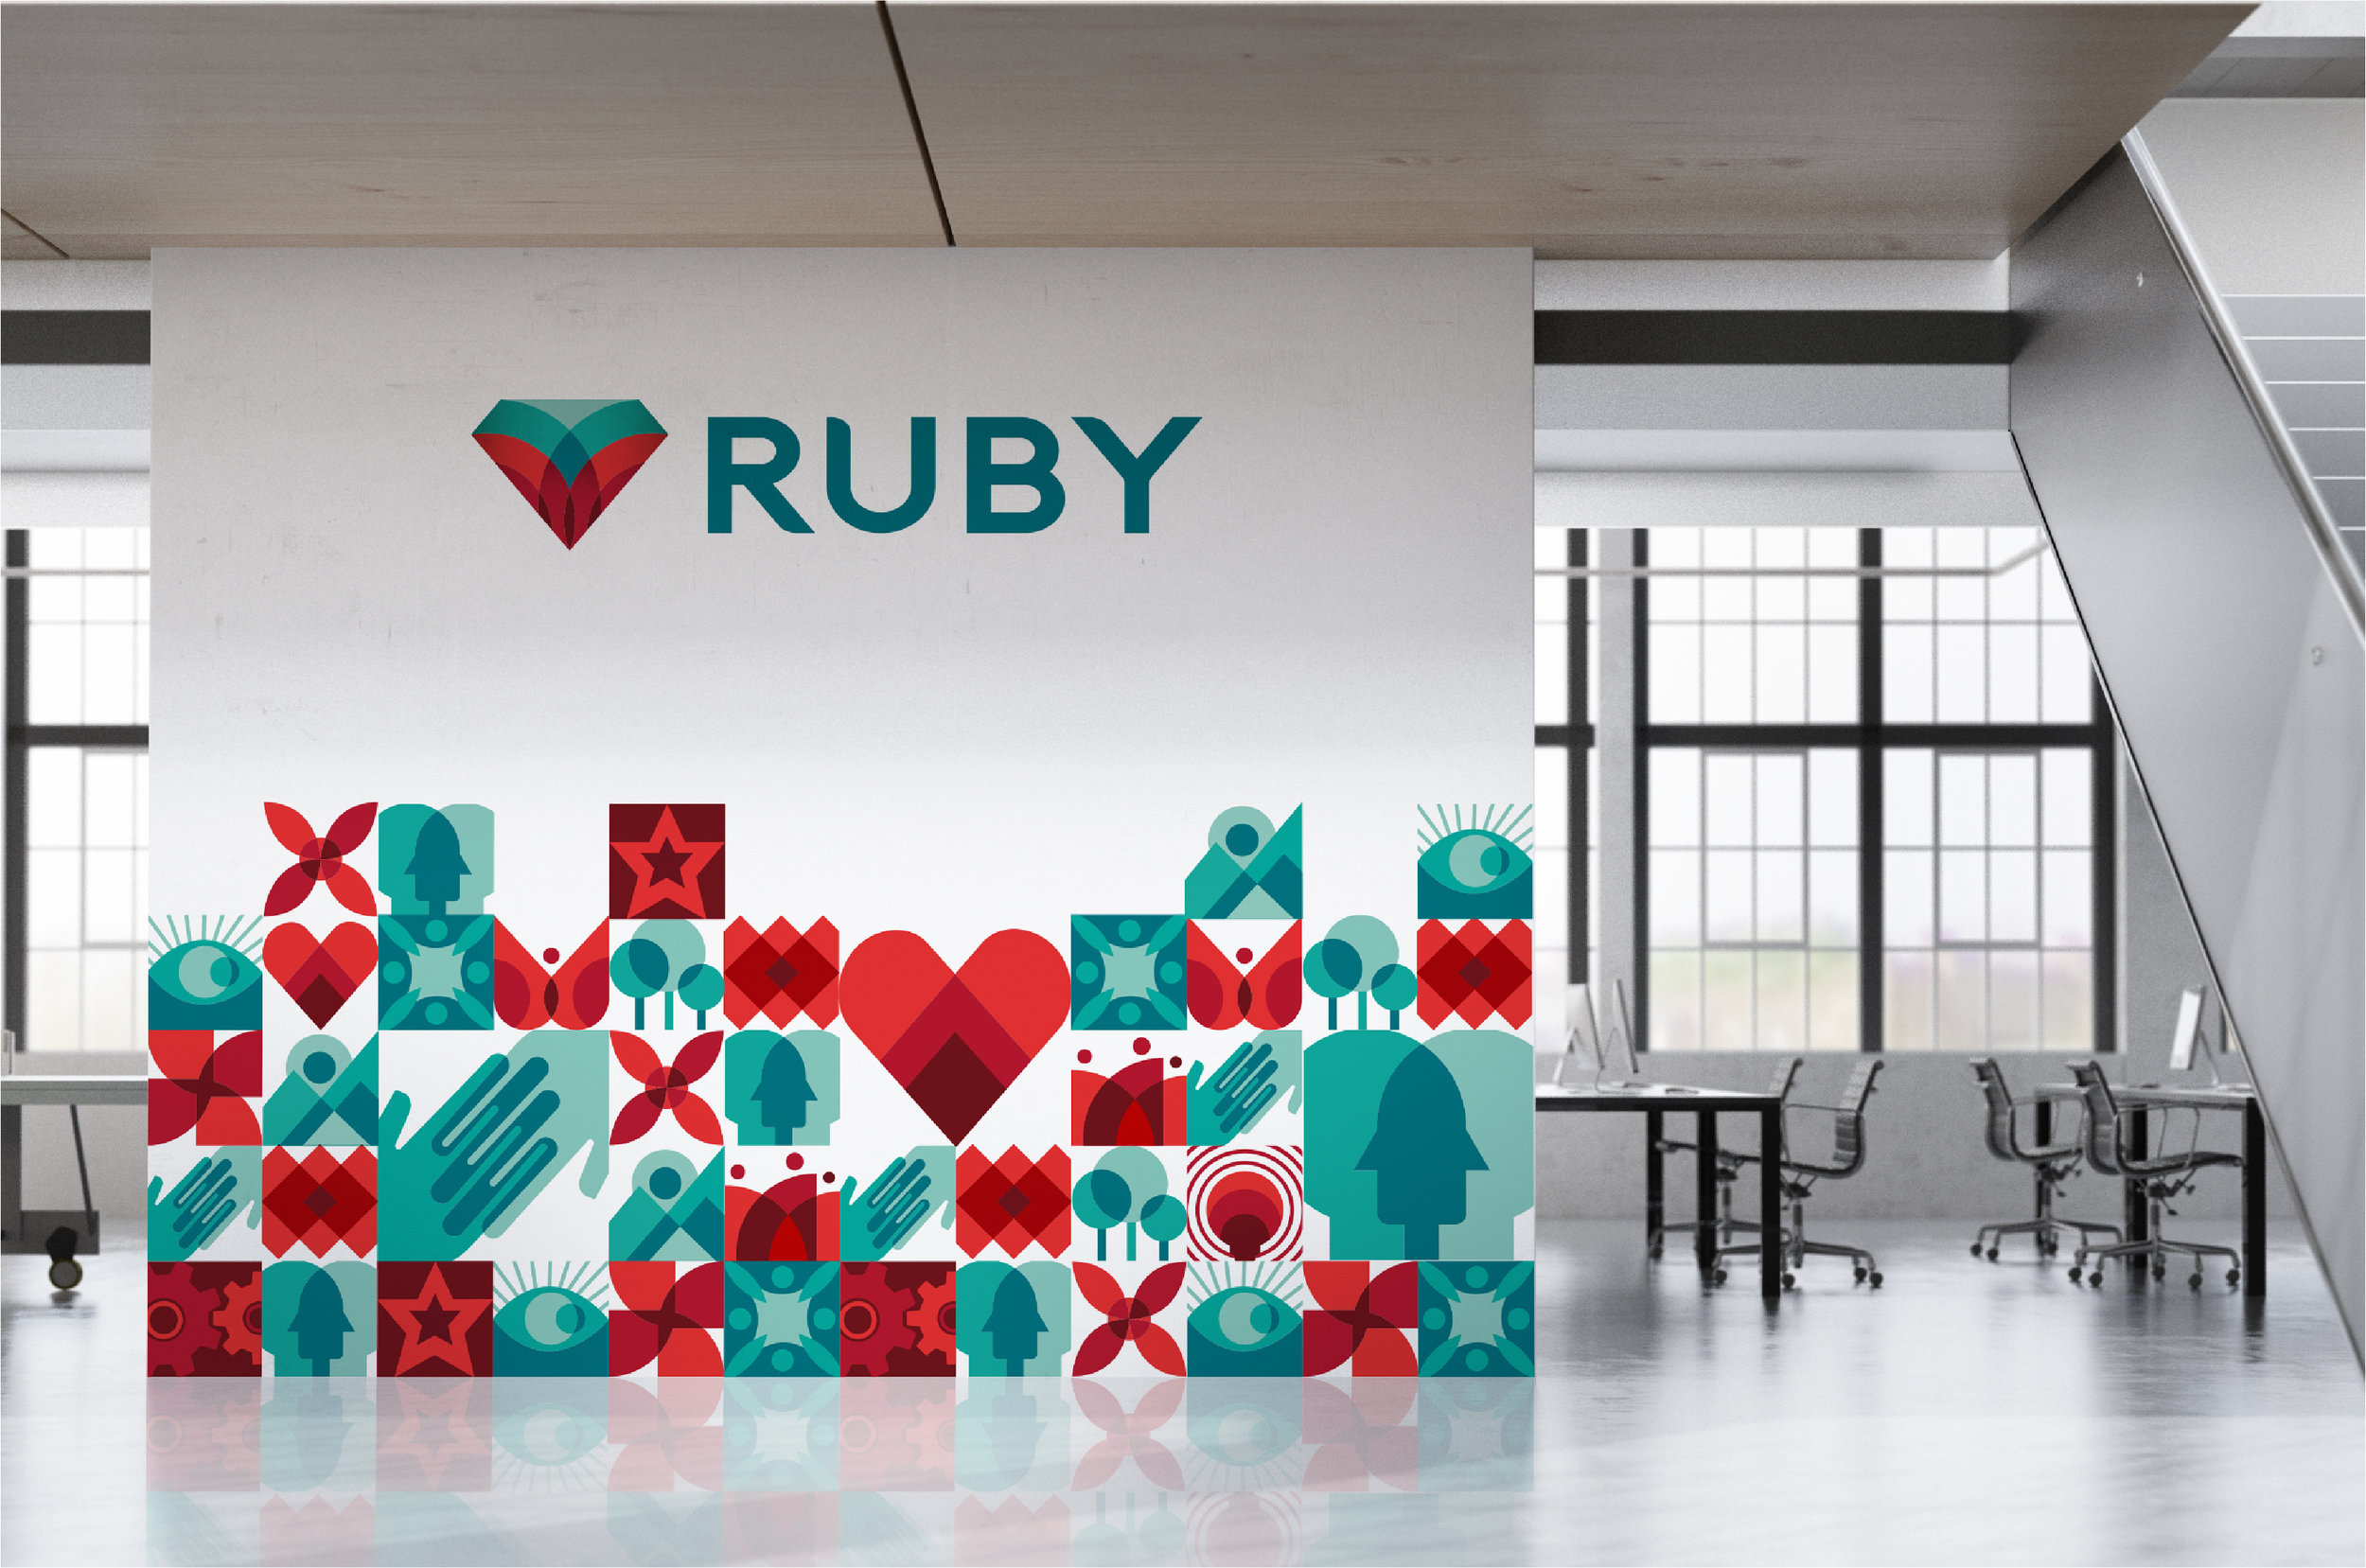 Ruby Mills_Branding Strategy, Communication Design_Elephant Design, Pune, Singapore_3.jpg